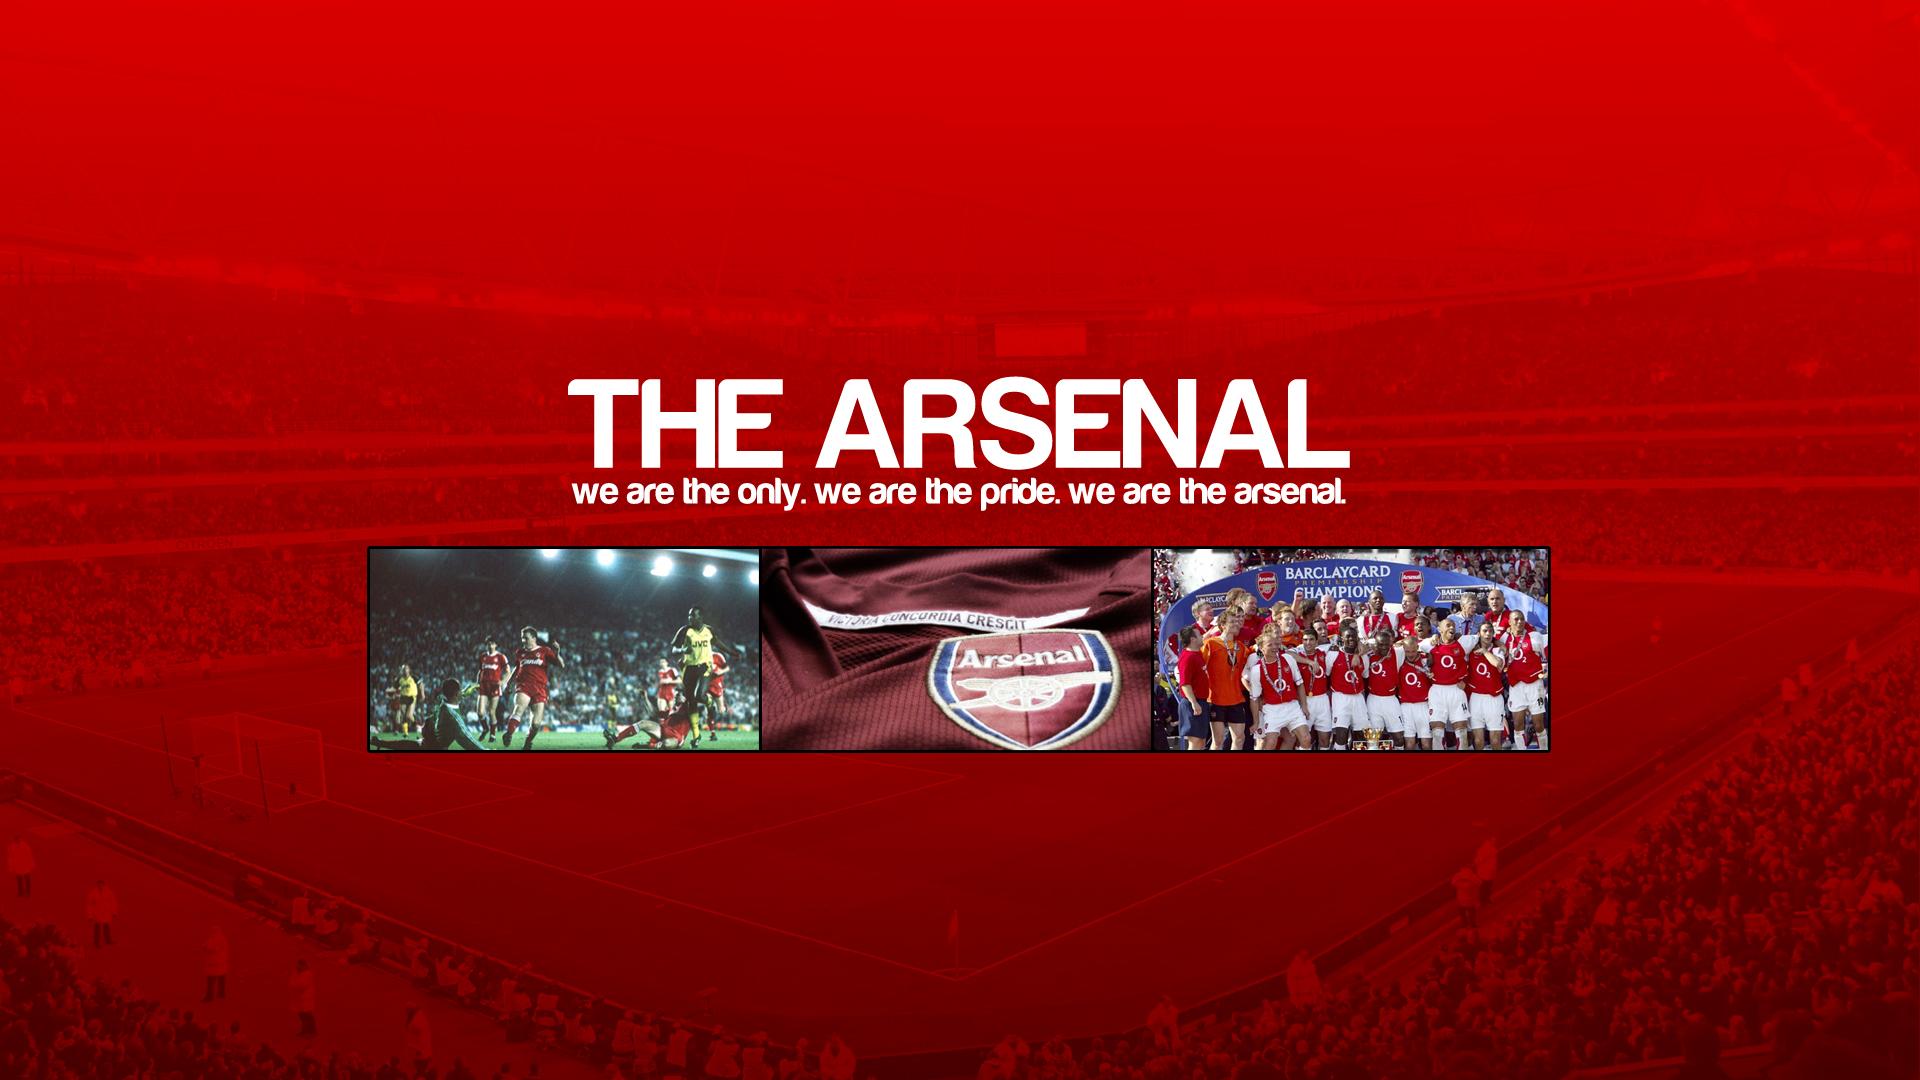 Arsenal FC Wallpaper 1920x1080 Arsenal FC 1920x1080